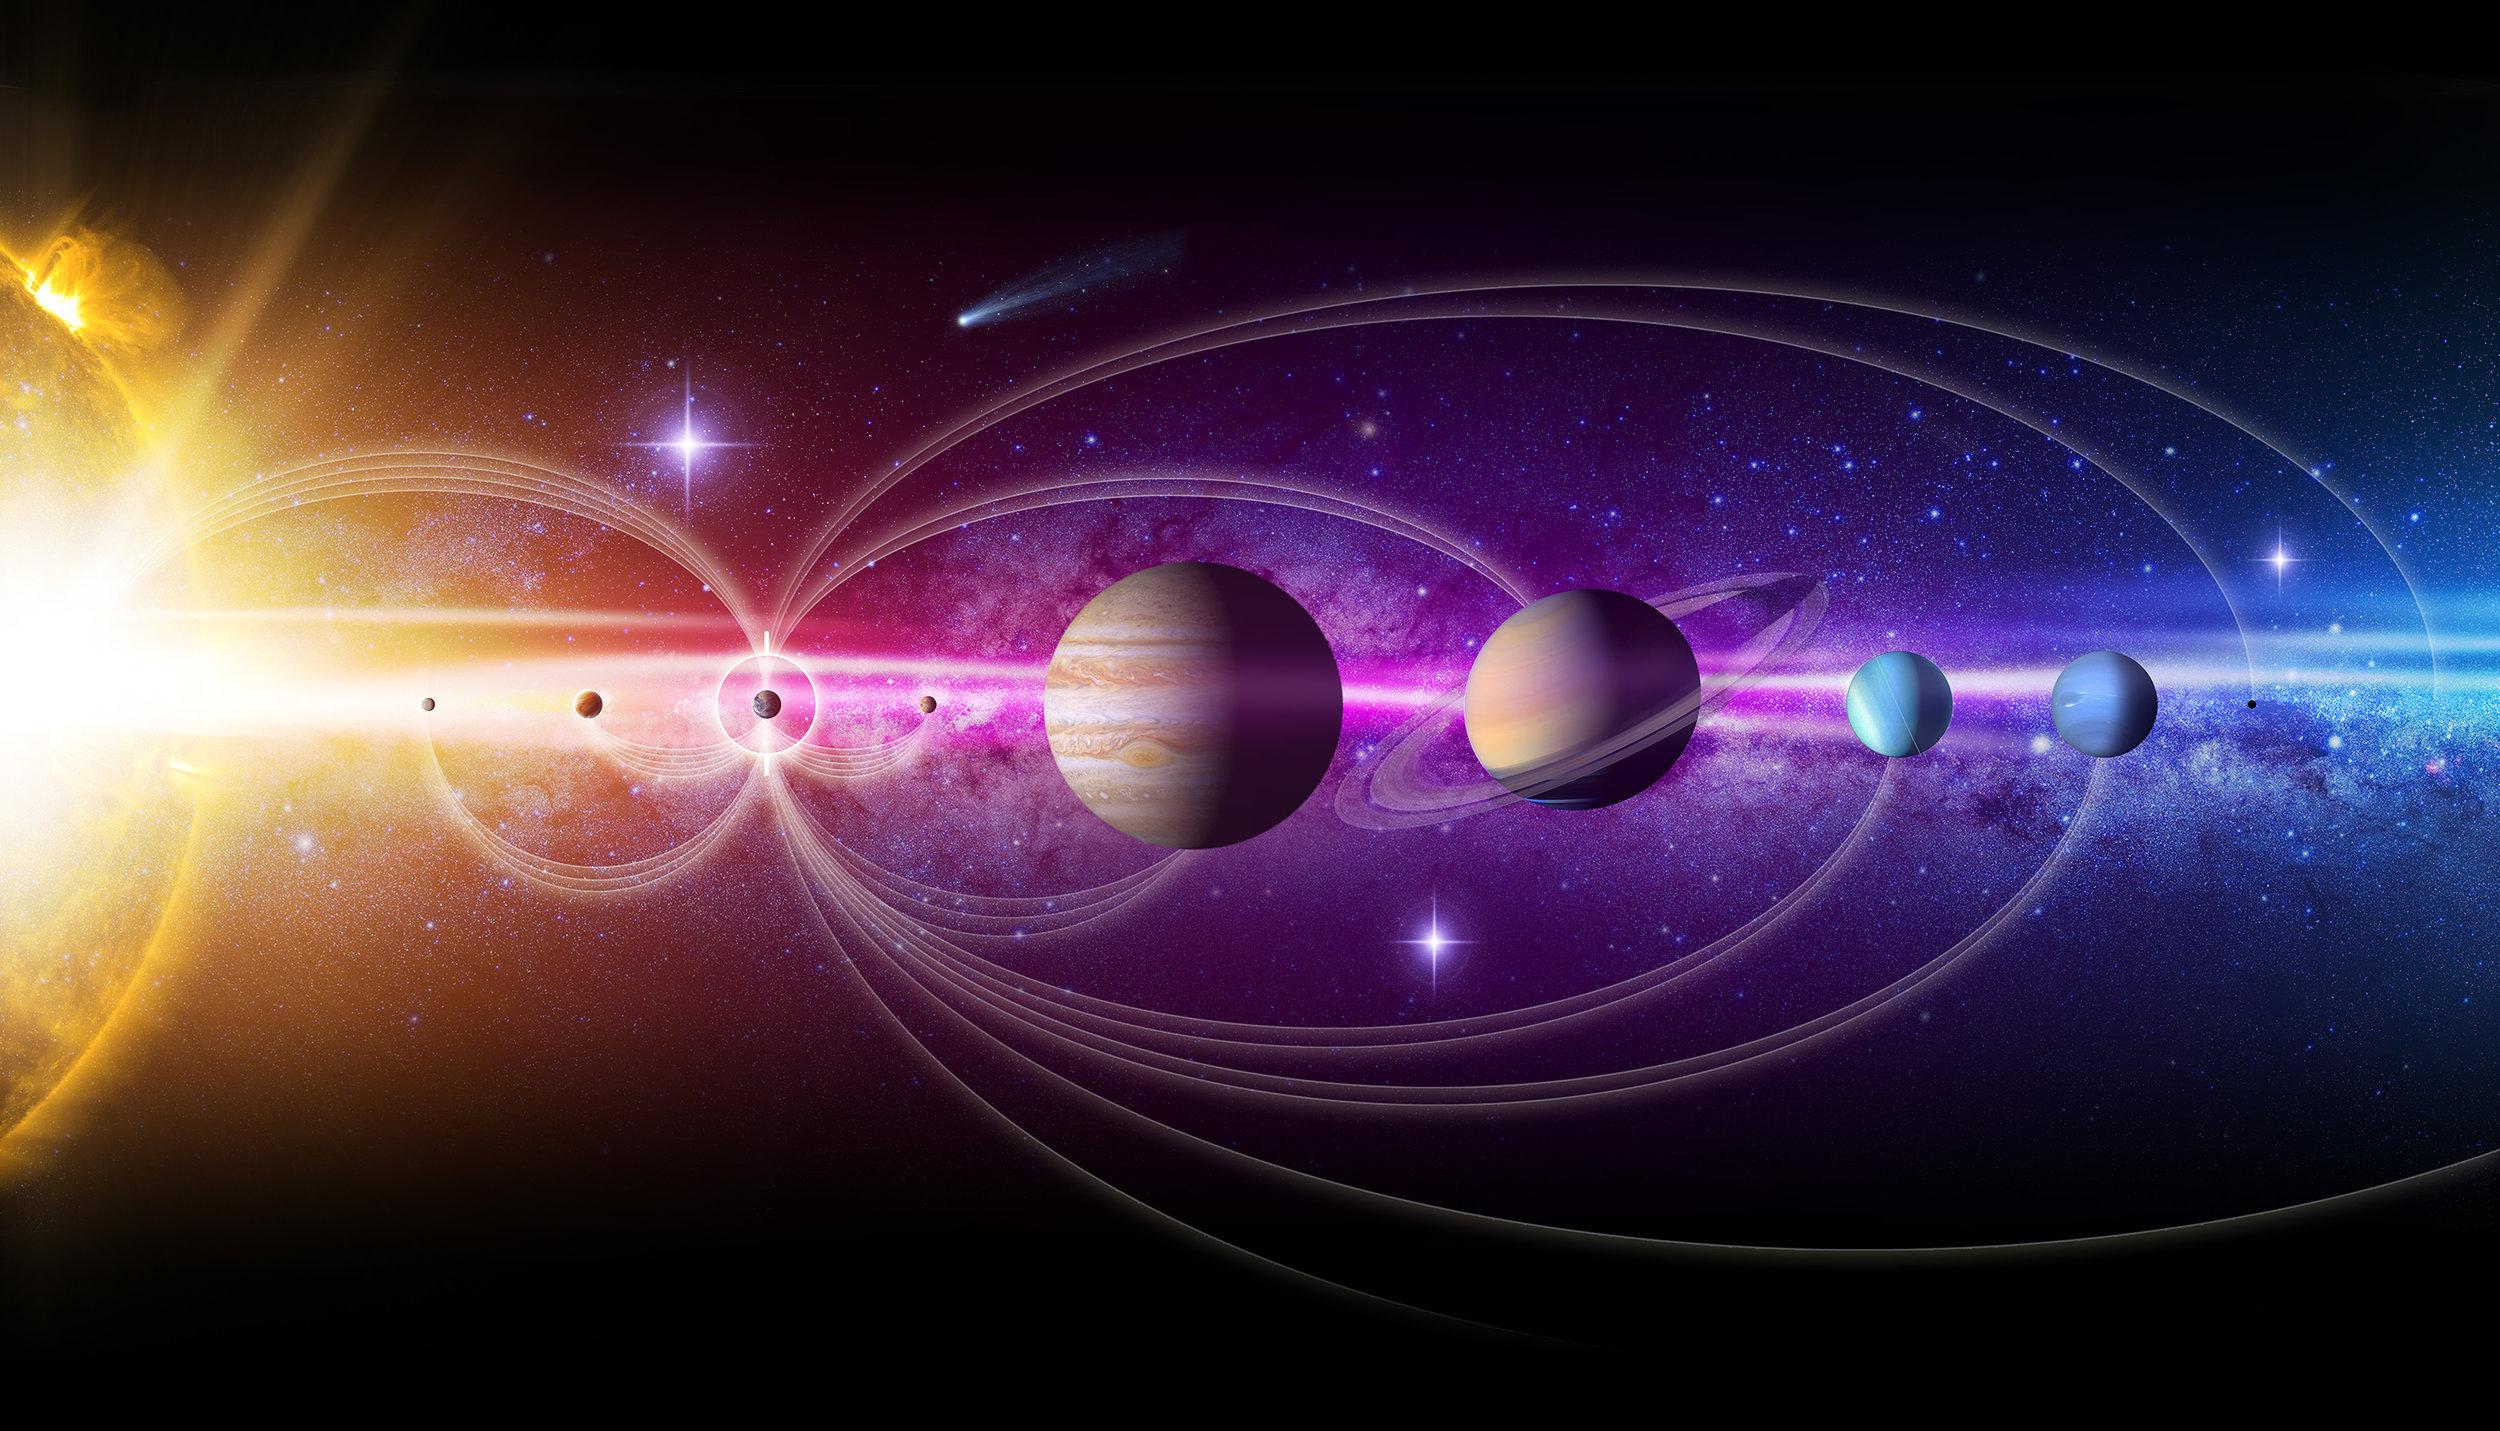 709_solarsystem_0.jpg